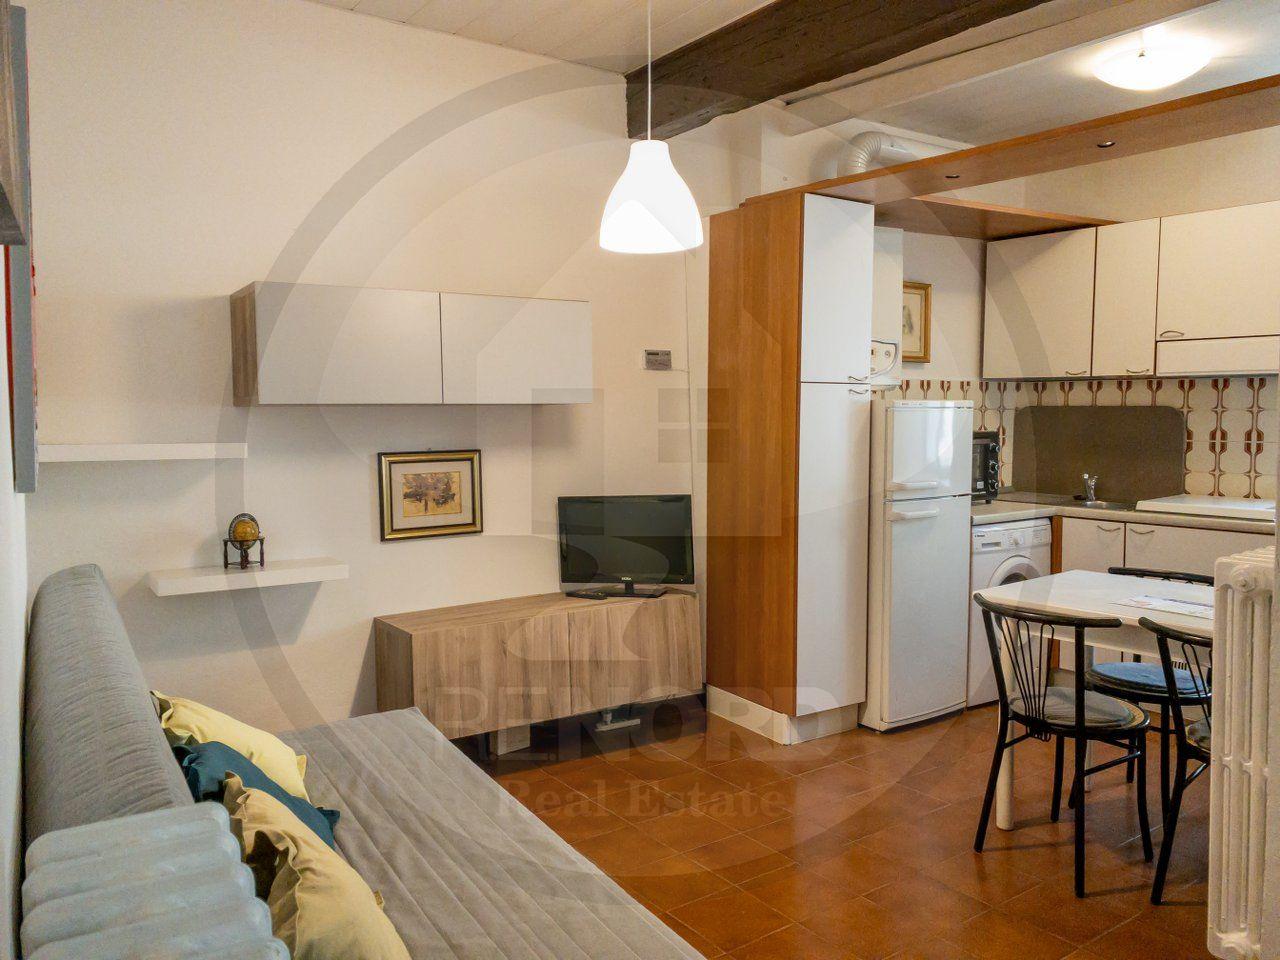 appartamento affitto pavia centro storico